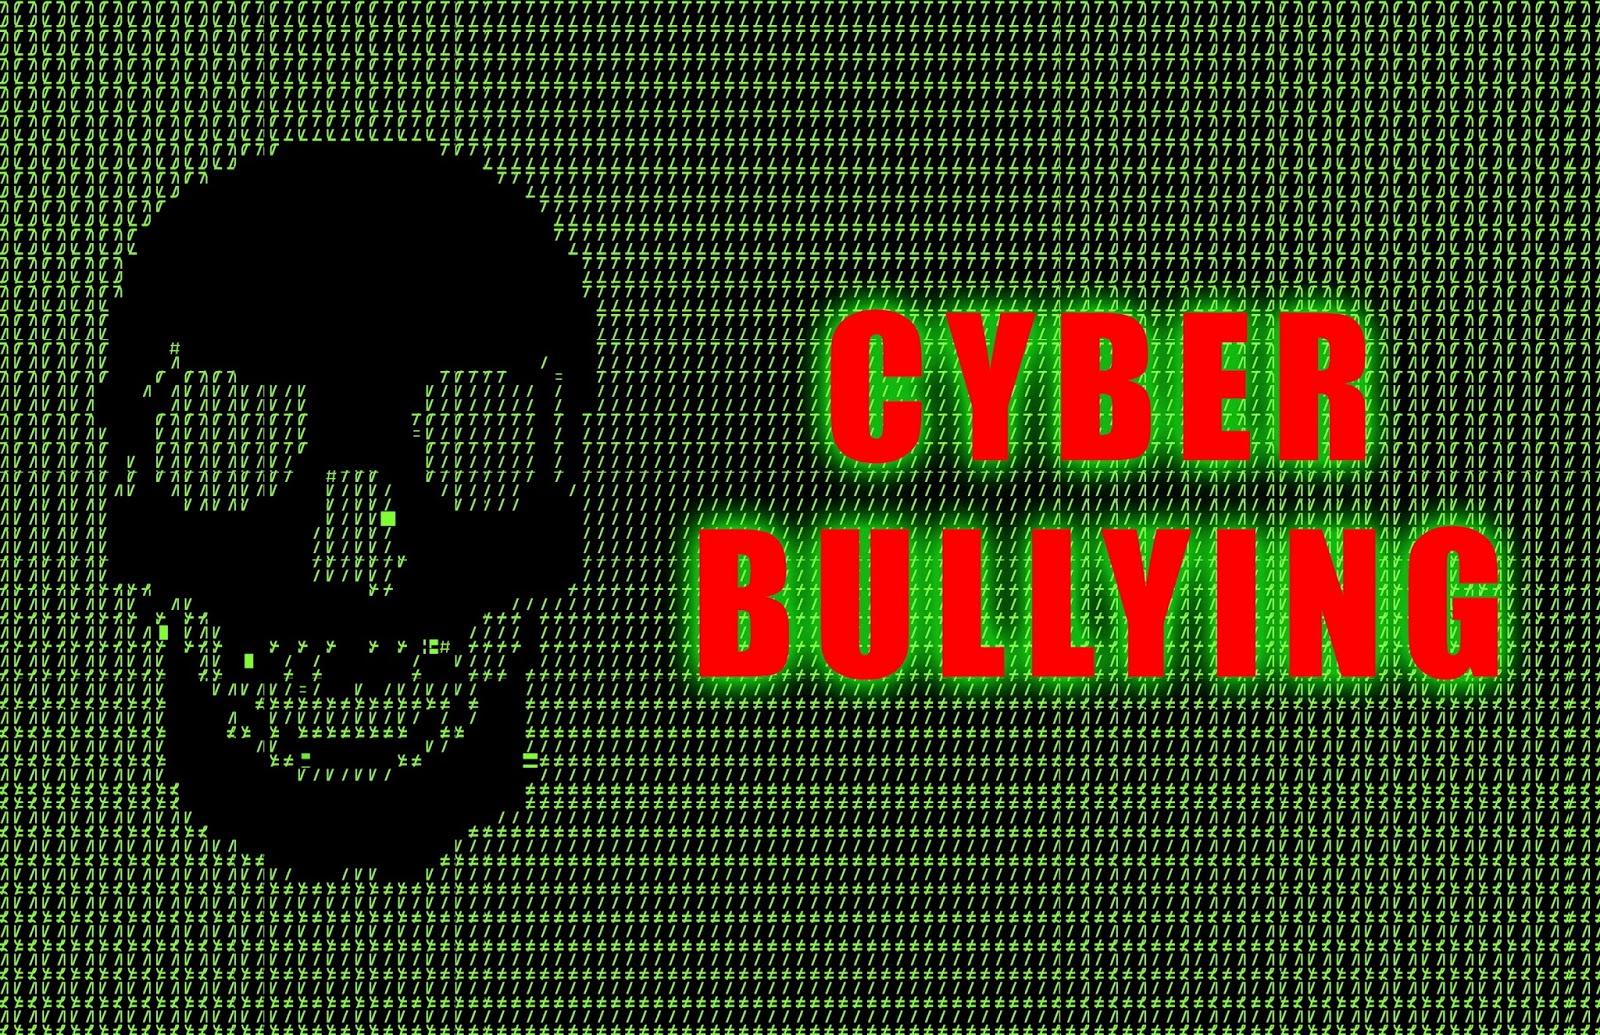 Why is cyberbullying bad